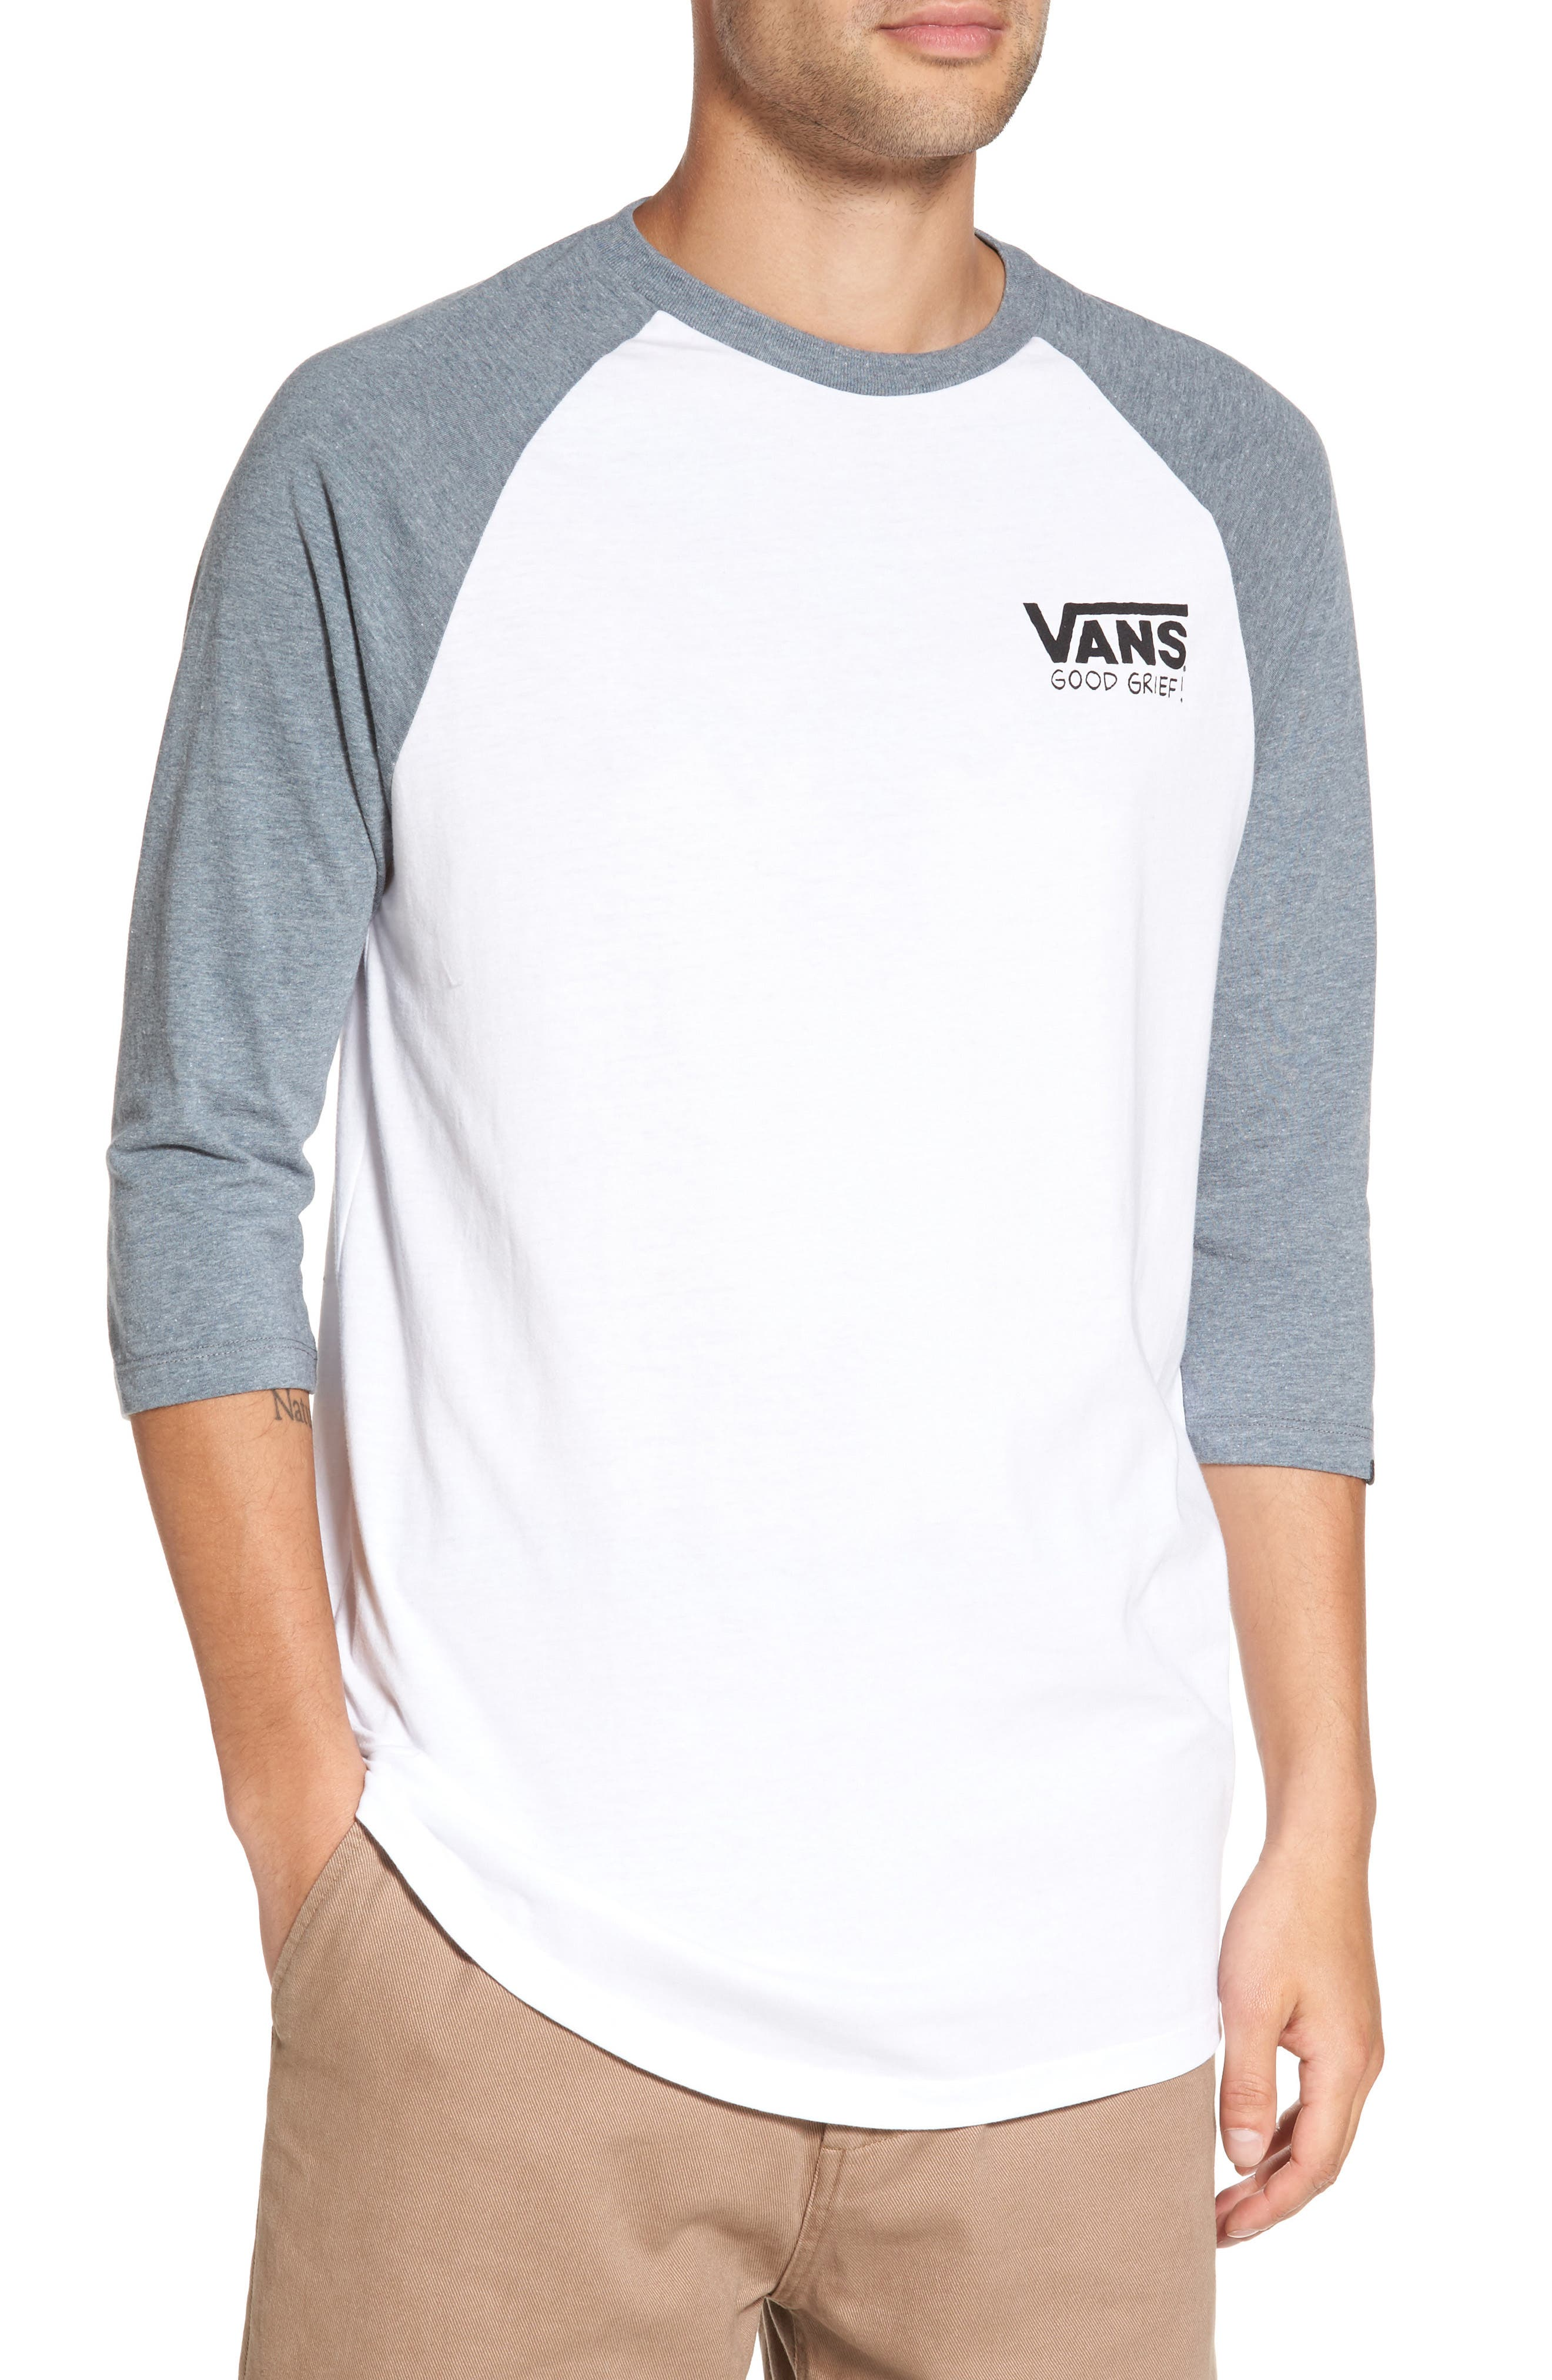 Vans x Peanuts Graphic Raglan T-Shirt